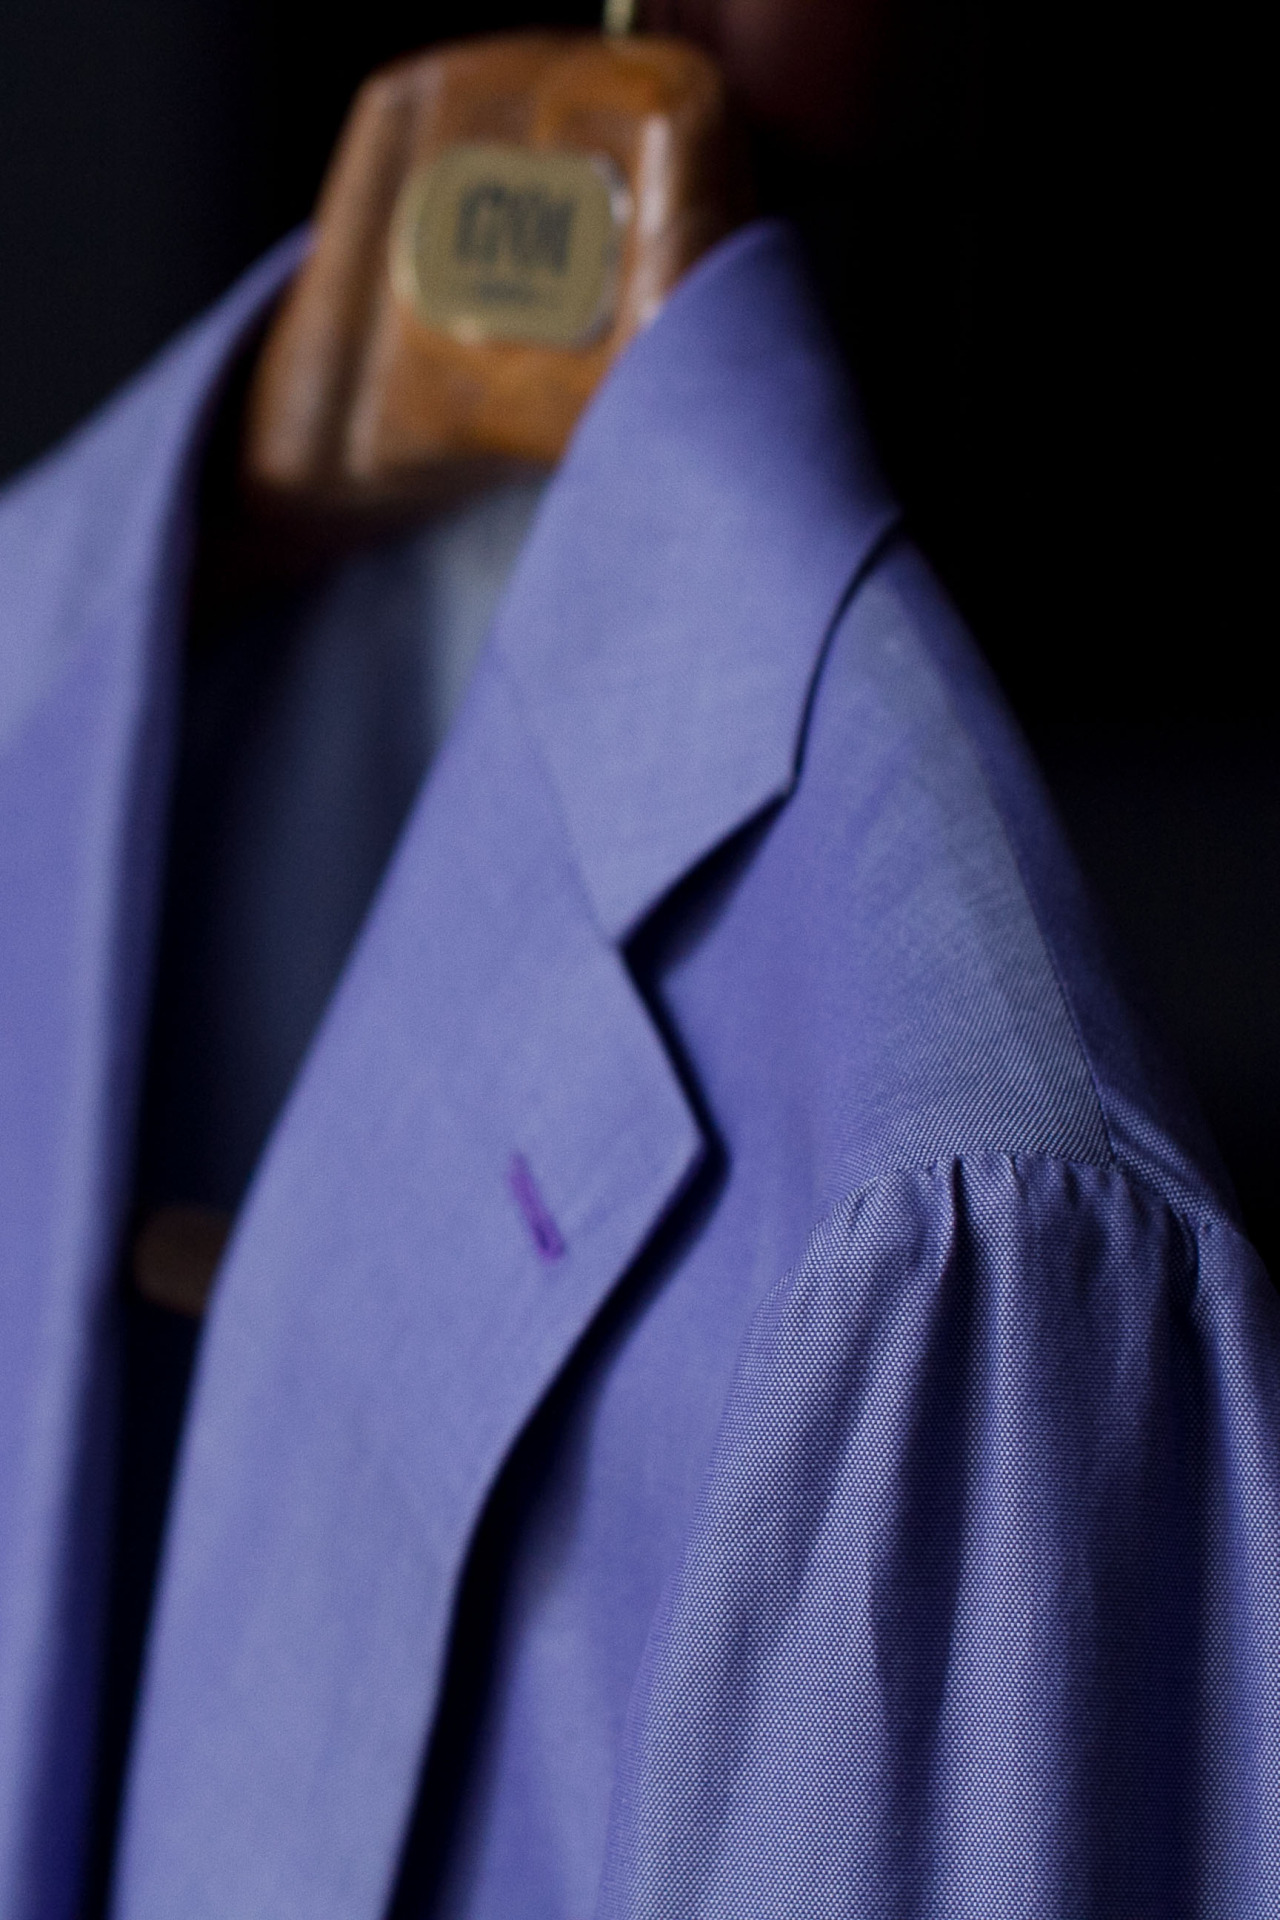 Spalla Camicia - Neapolitan shirt shoulder